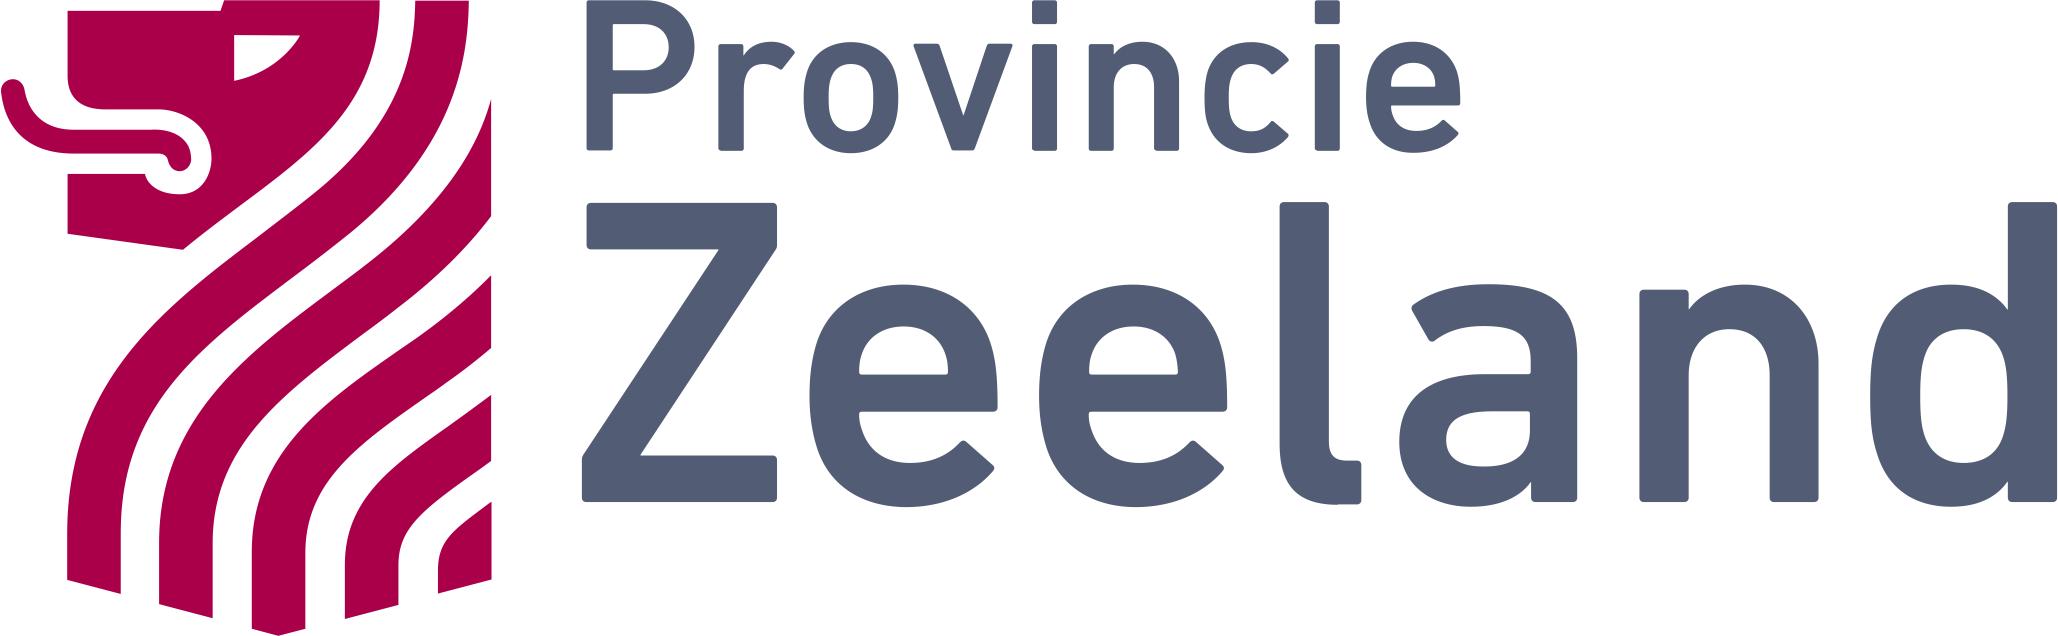 logo-zeeland-kleur.png